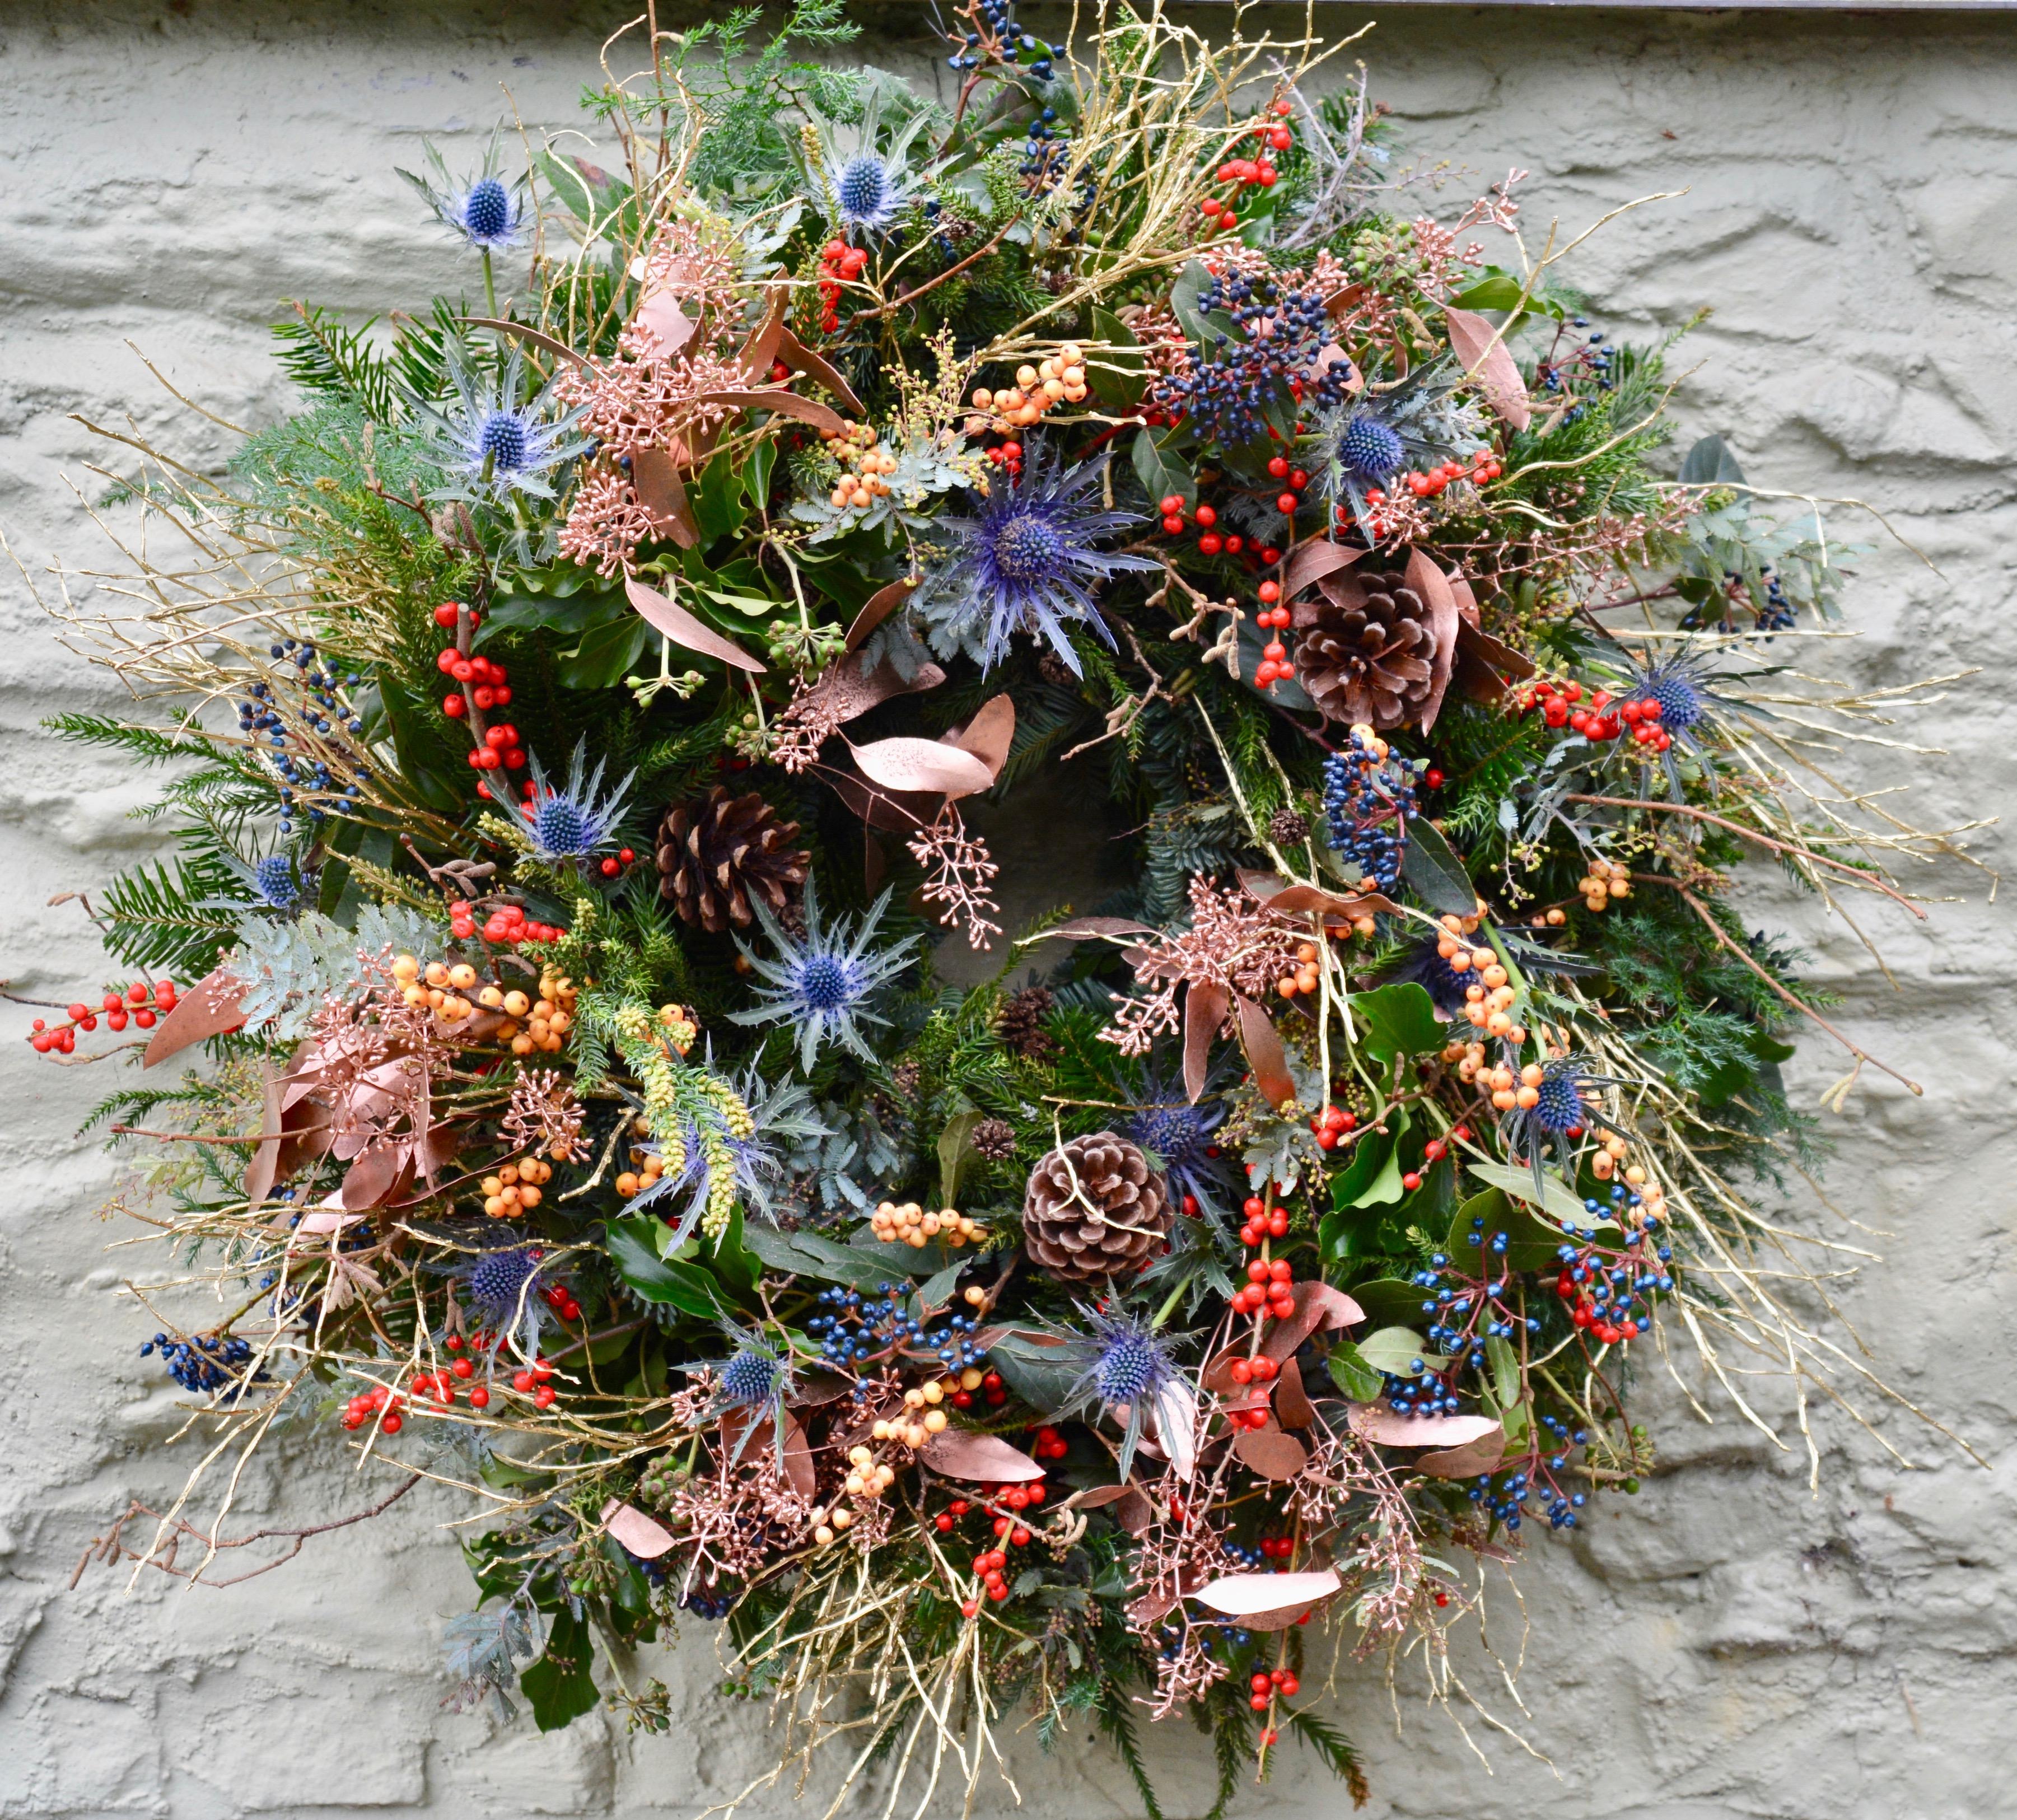 The Davidson Festive Wreath